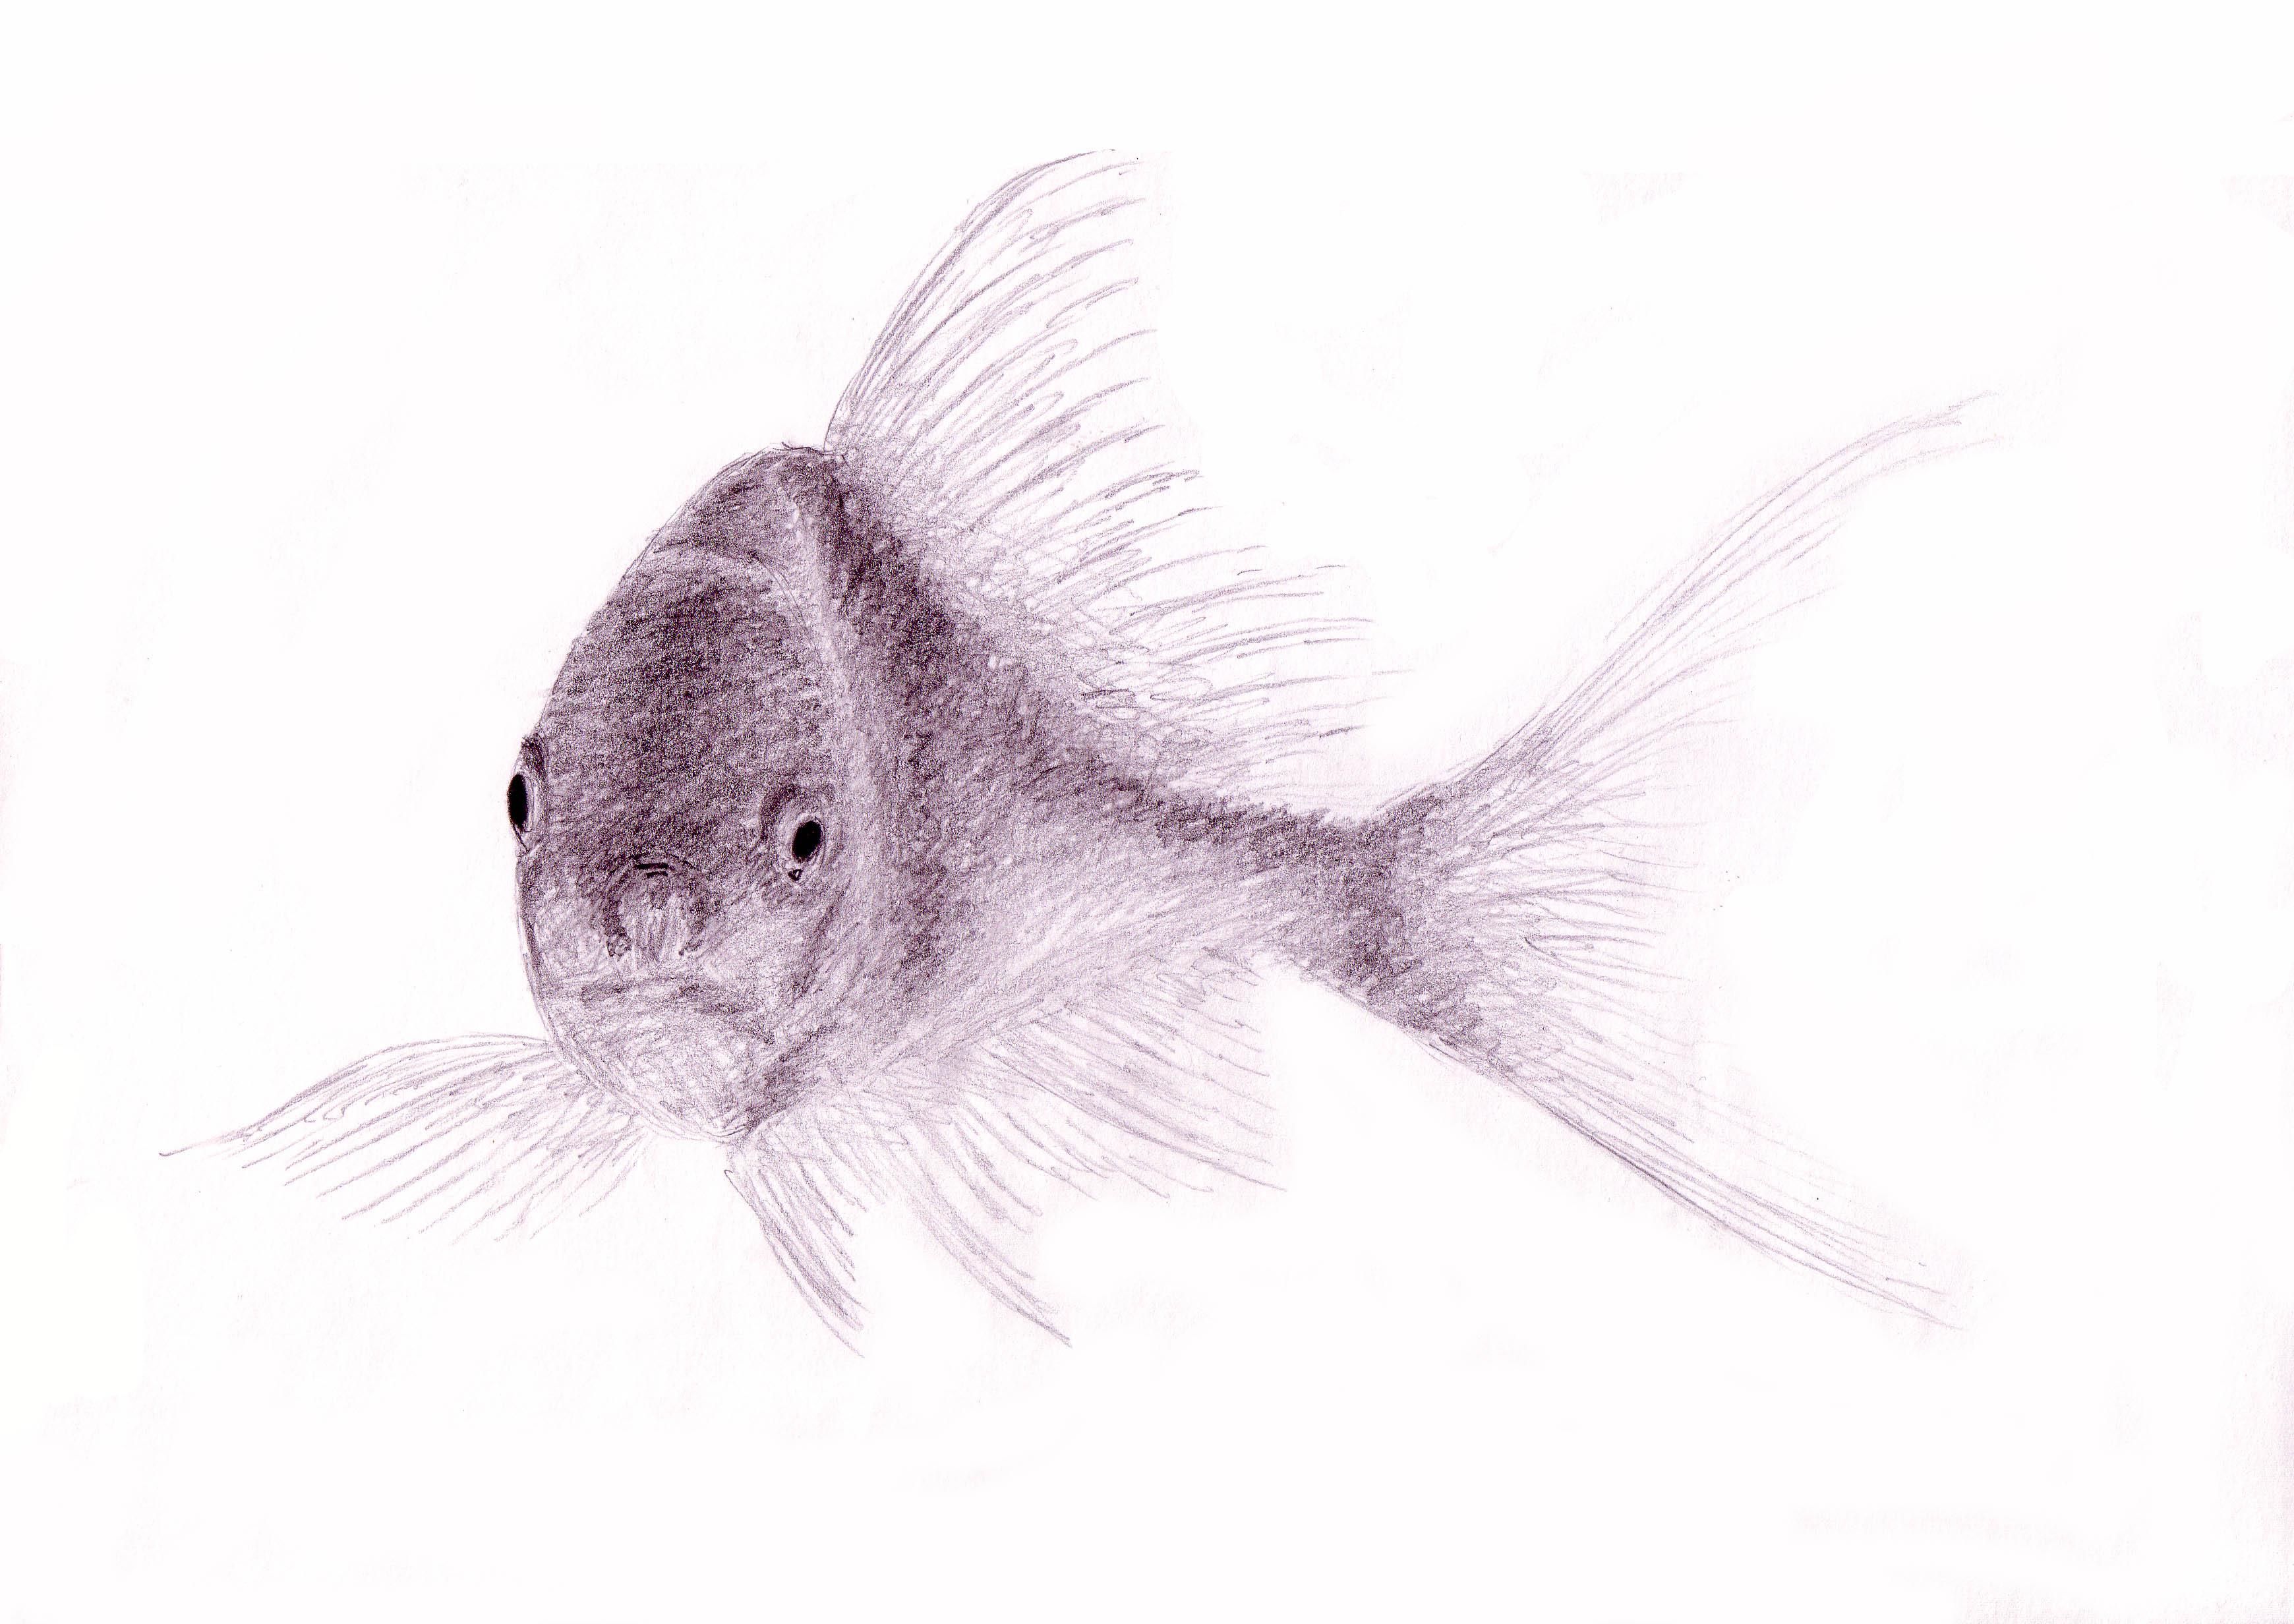 Koi Fish Pencil Drawing At Getdrawings Free Download